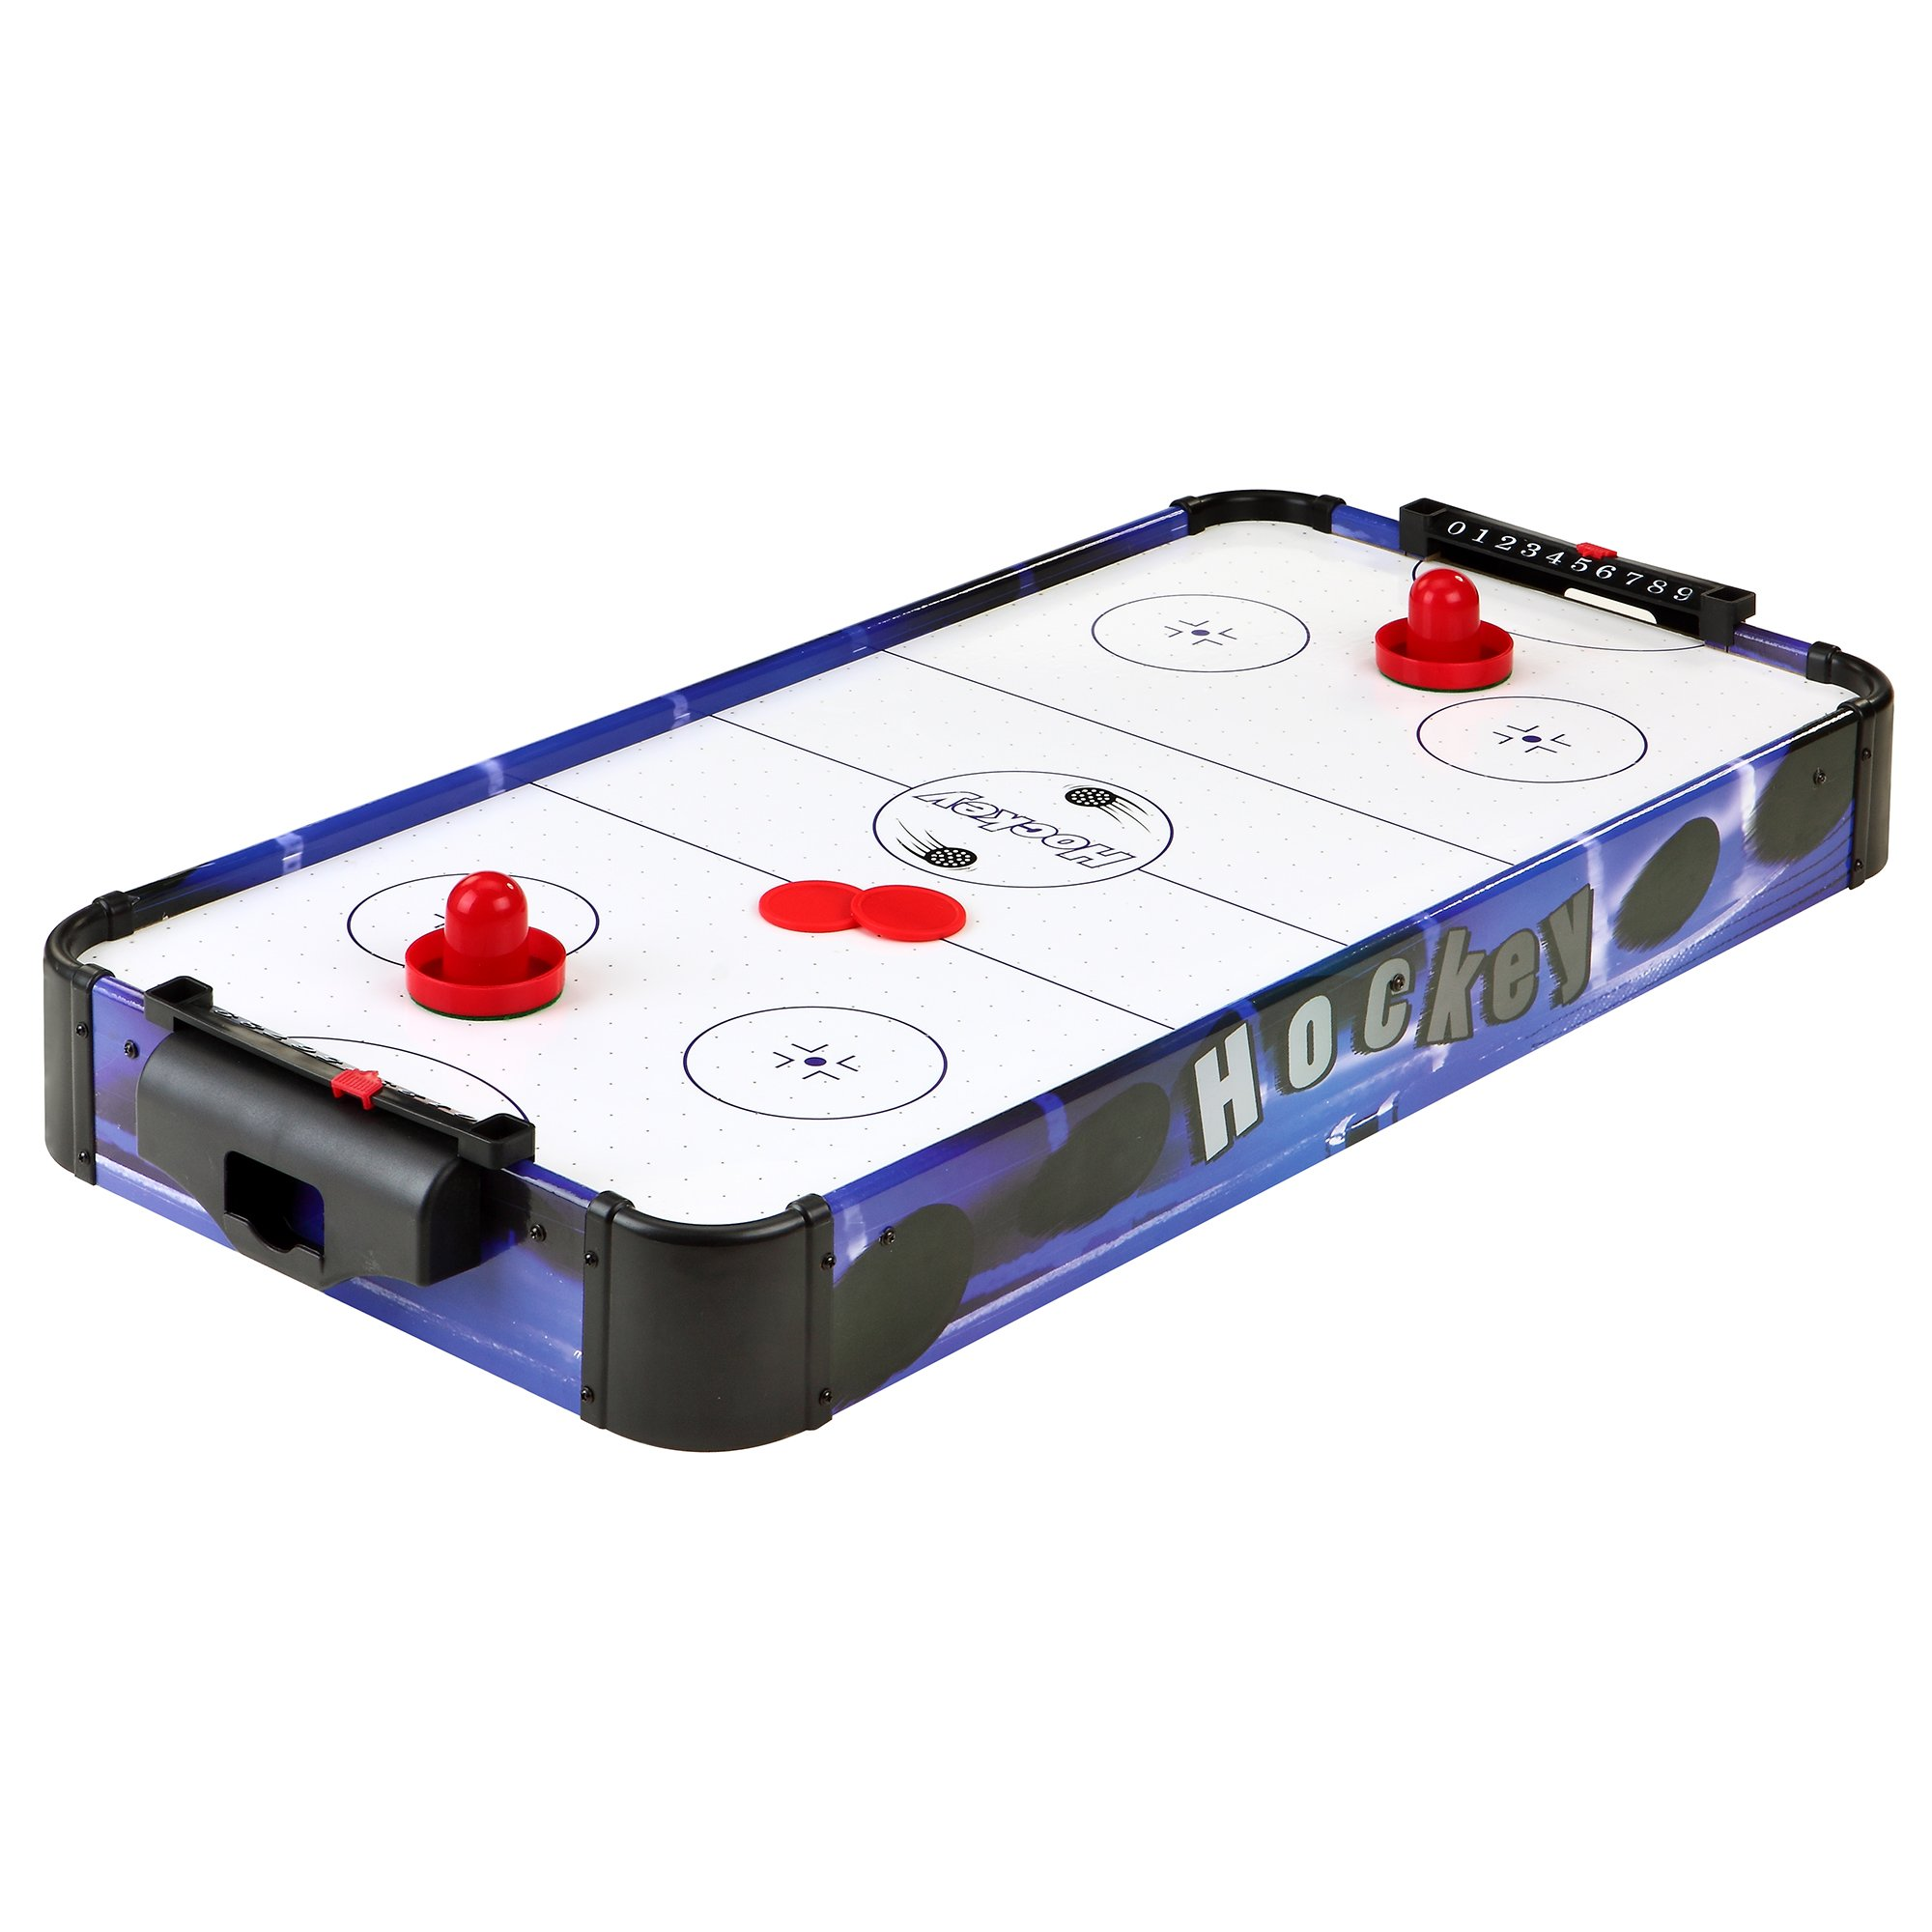 Hathaway Blue Line Portable Air Hockey Table (Royal Blue, 32-Inch) by Hathaway